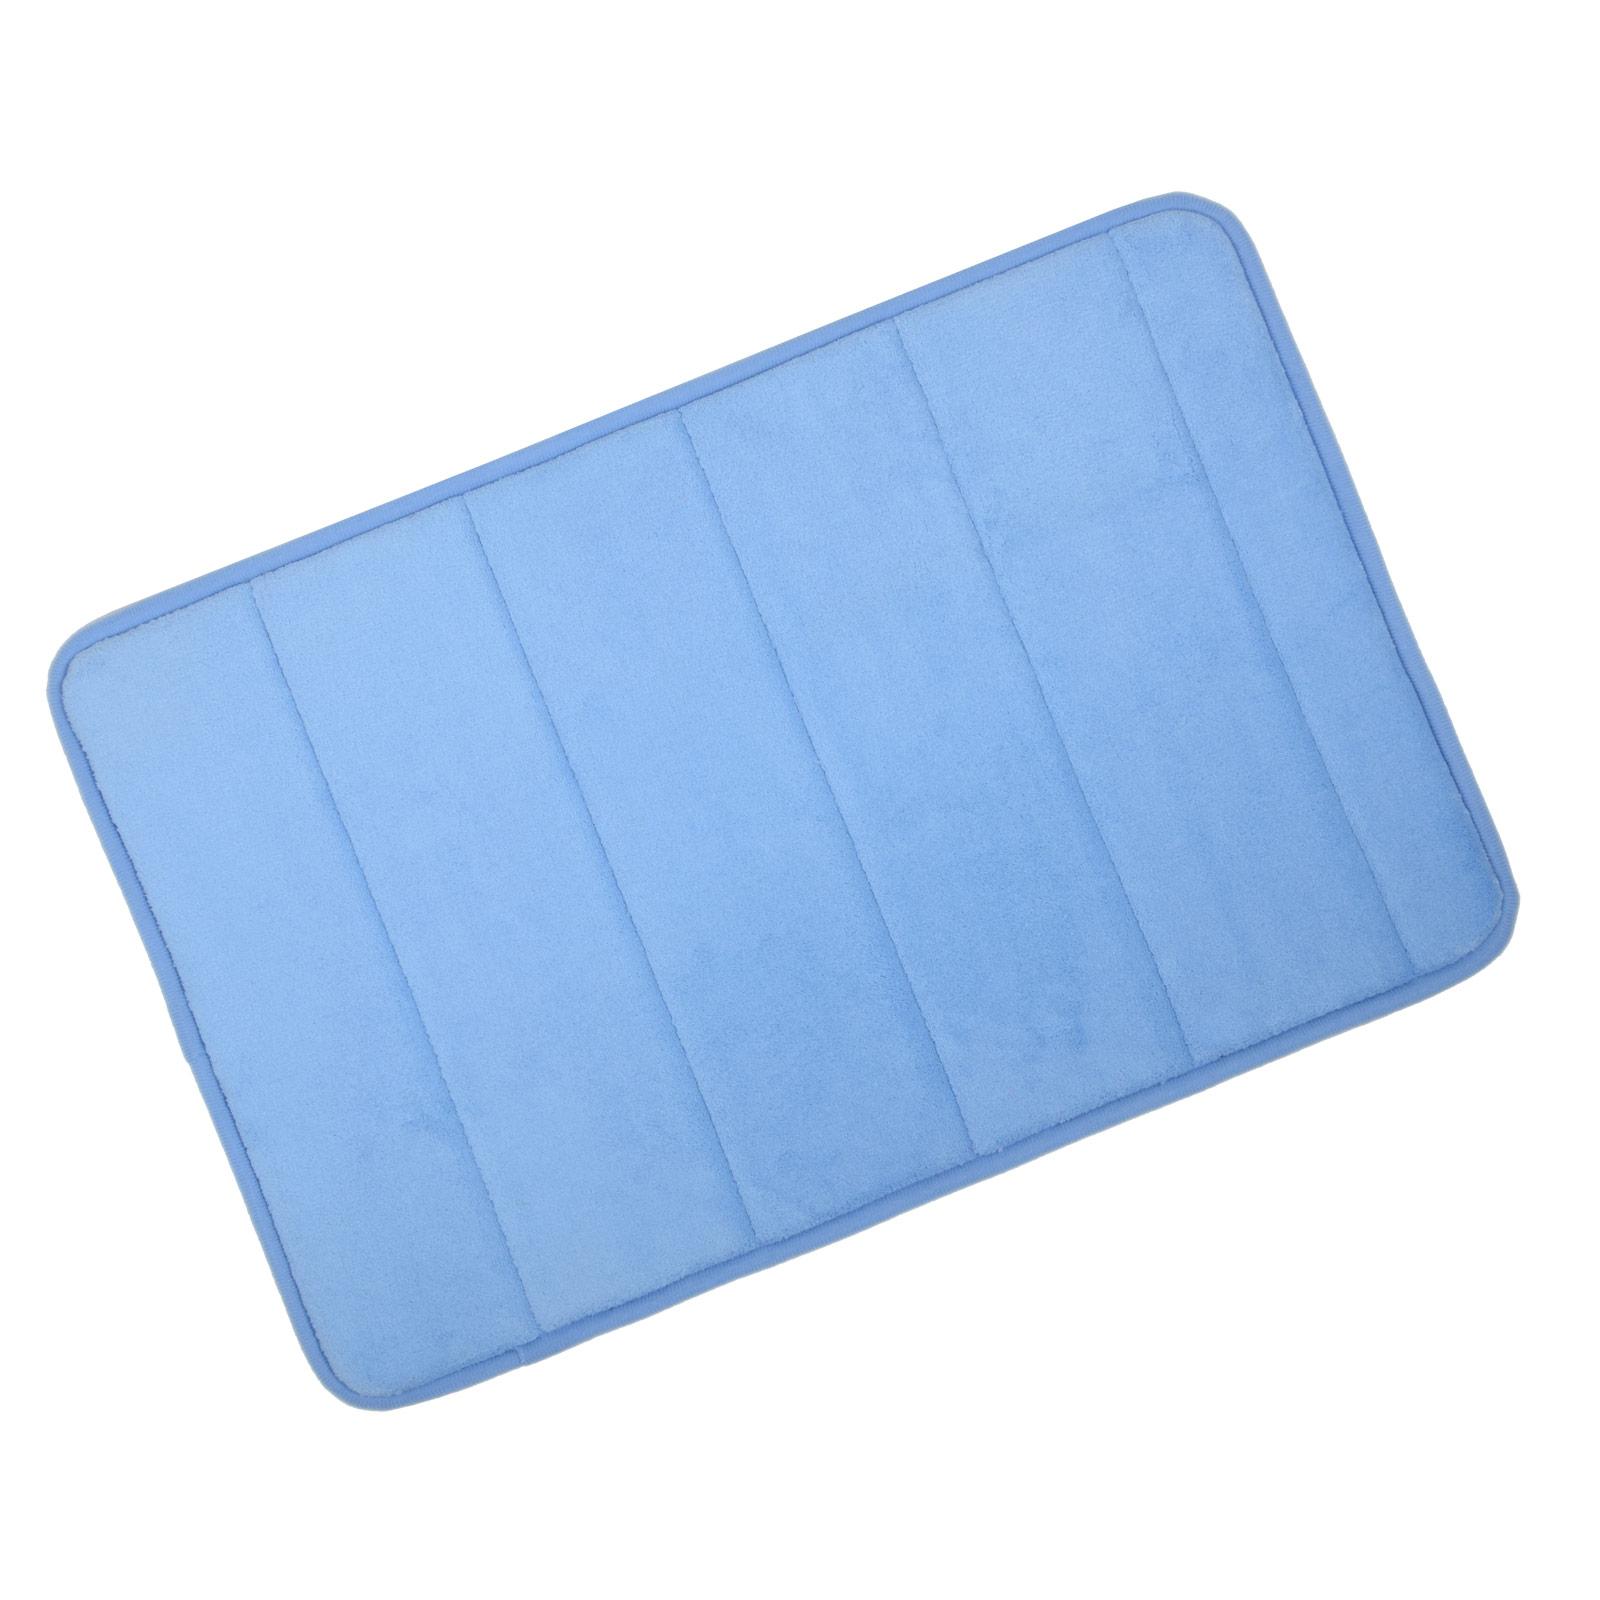 microfibre memory foam bathroom shower bath mat with non slip back 22 colours. Black Bedroom Furniture Sets. Home Design Ideas